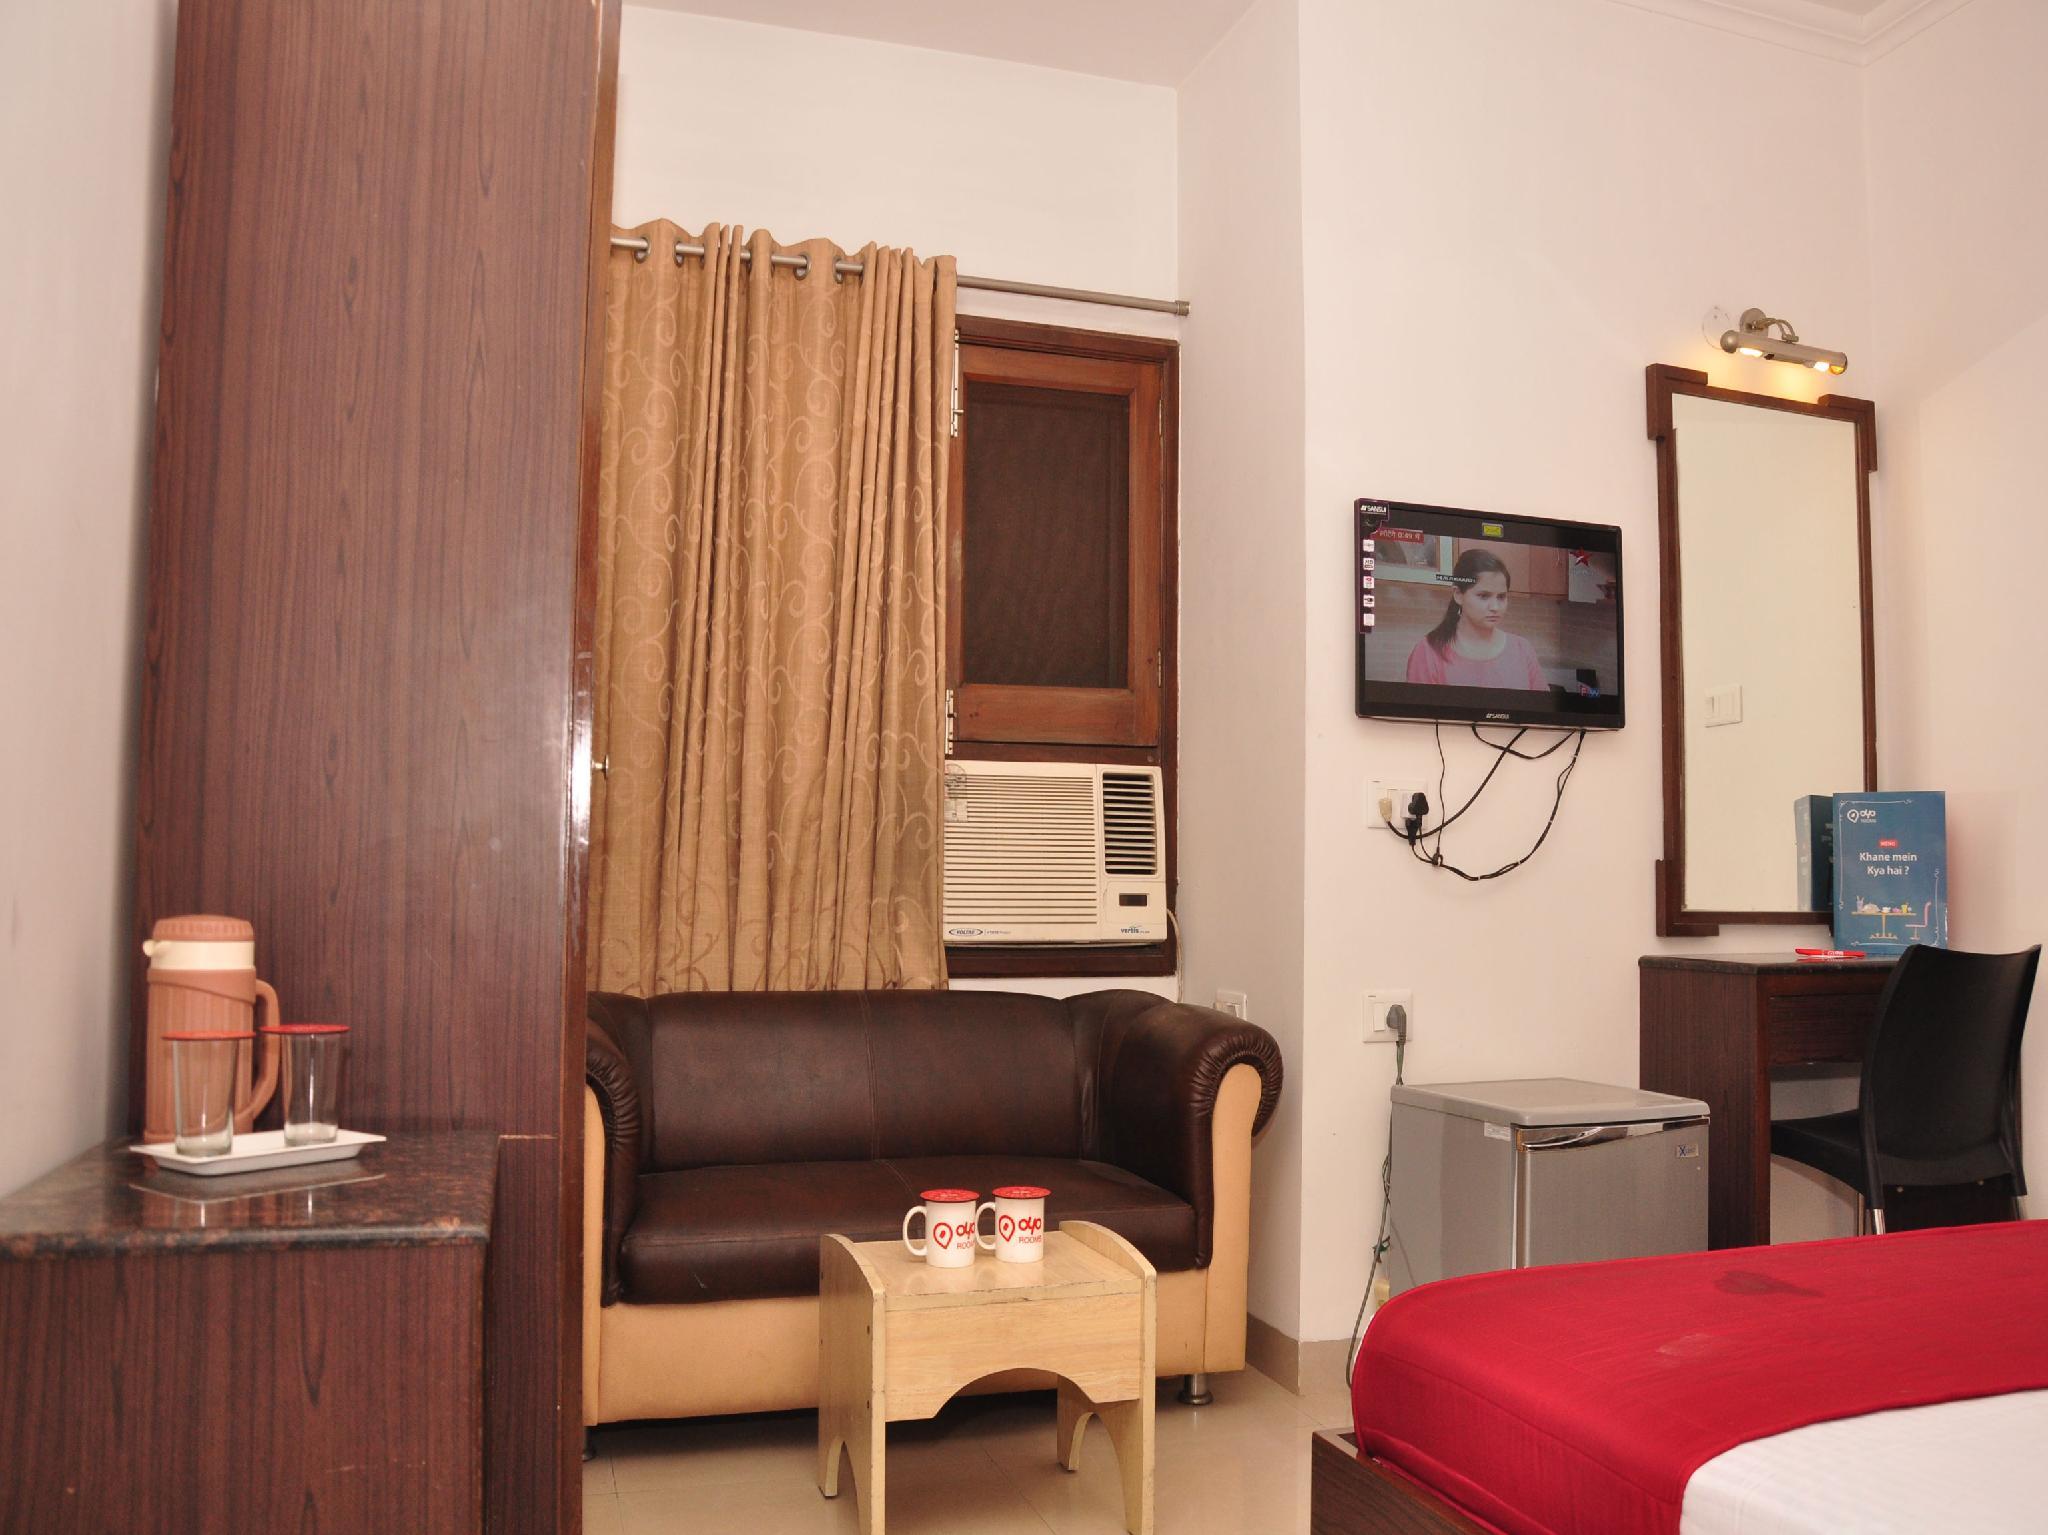 Oyo Rooms Bazar Mai Sewan Near Golden Temple